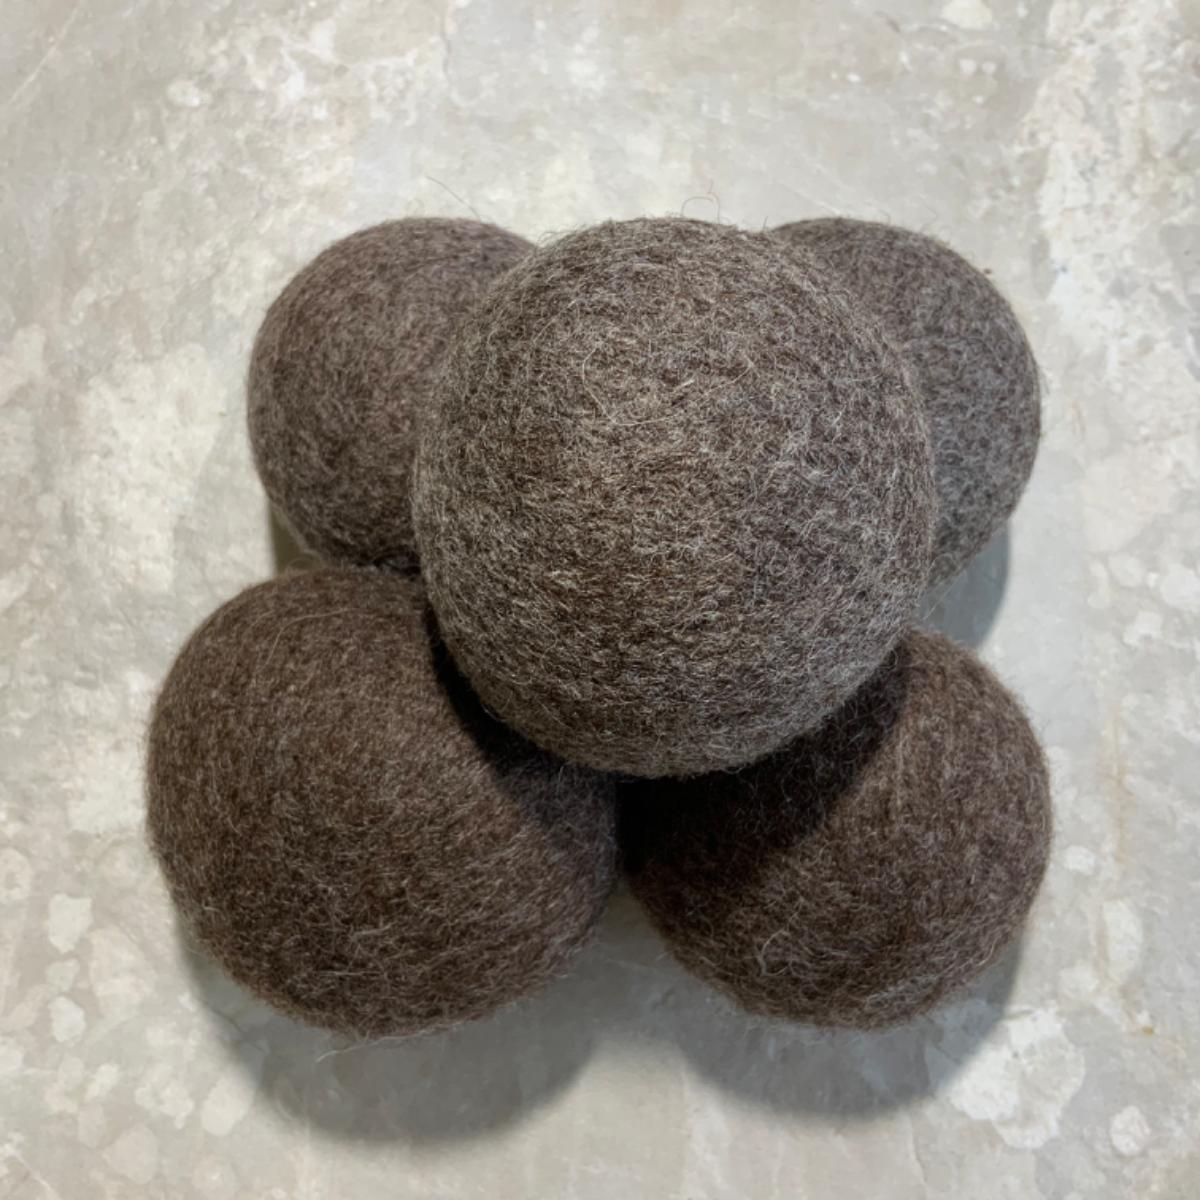 wool-dryer-balls-set-of-5